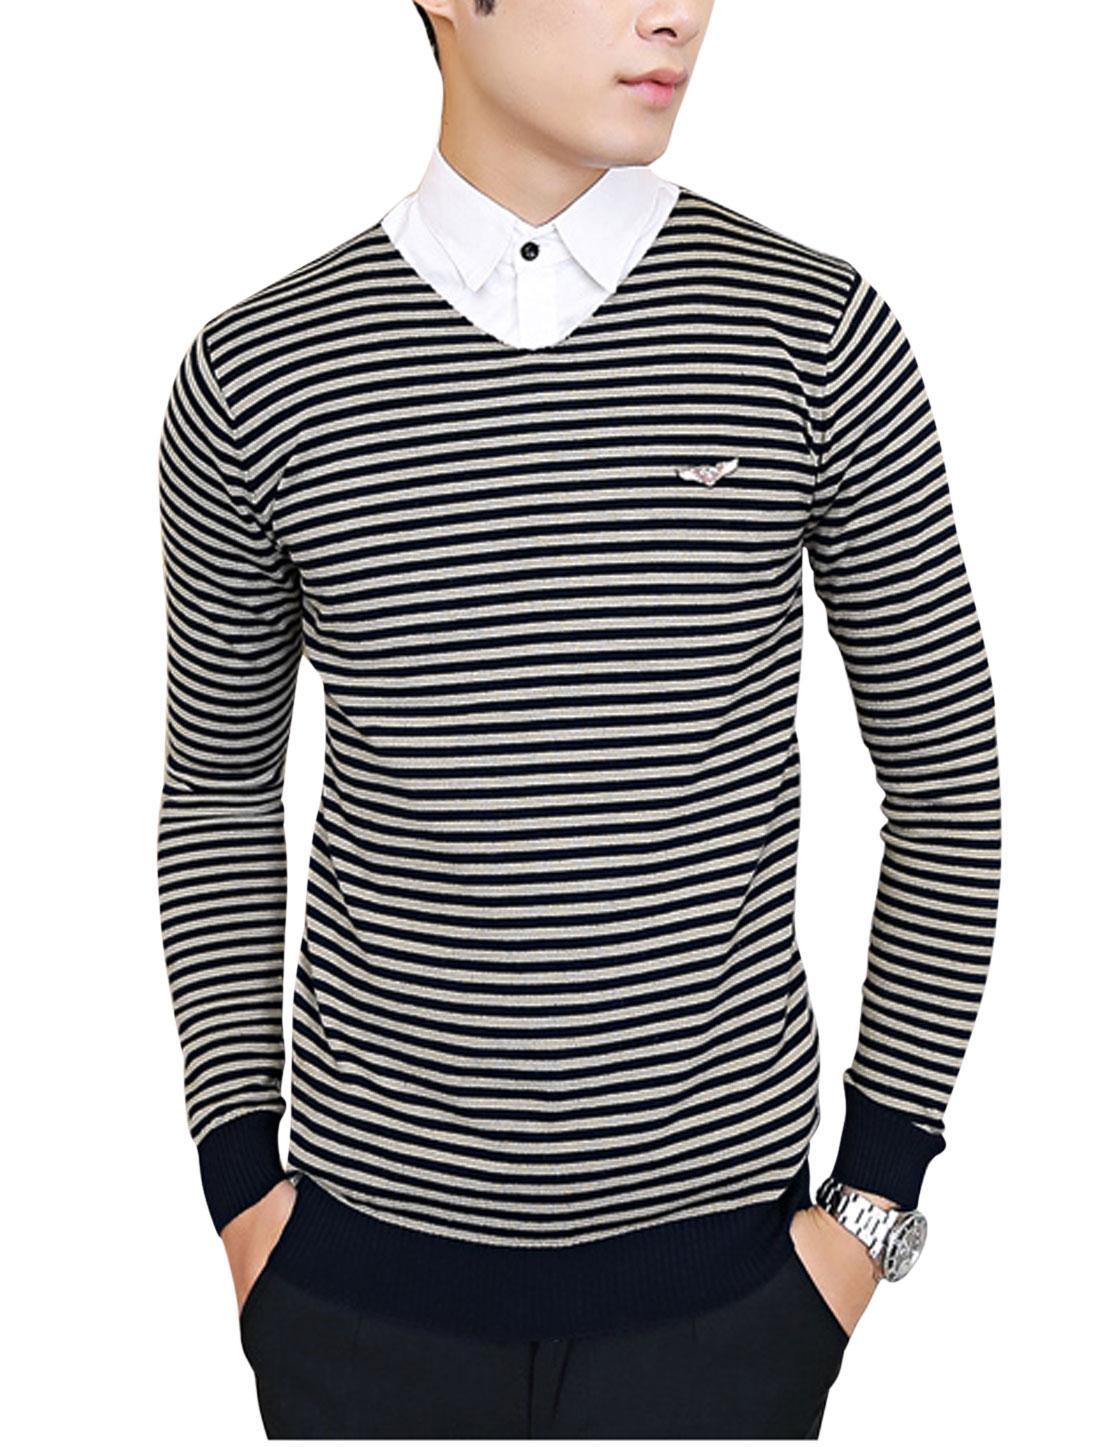 Men V Neck Stripes Long Sleeve Ribbed Hem Knit Shirt Navy Blue Camel S